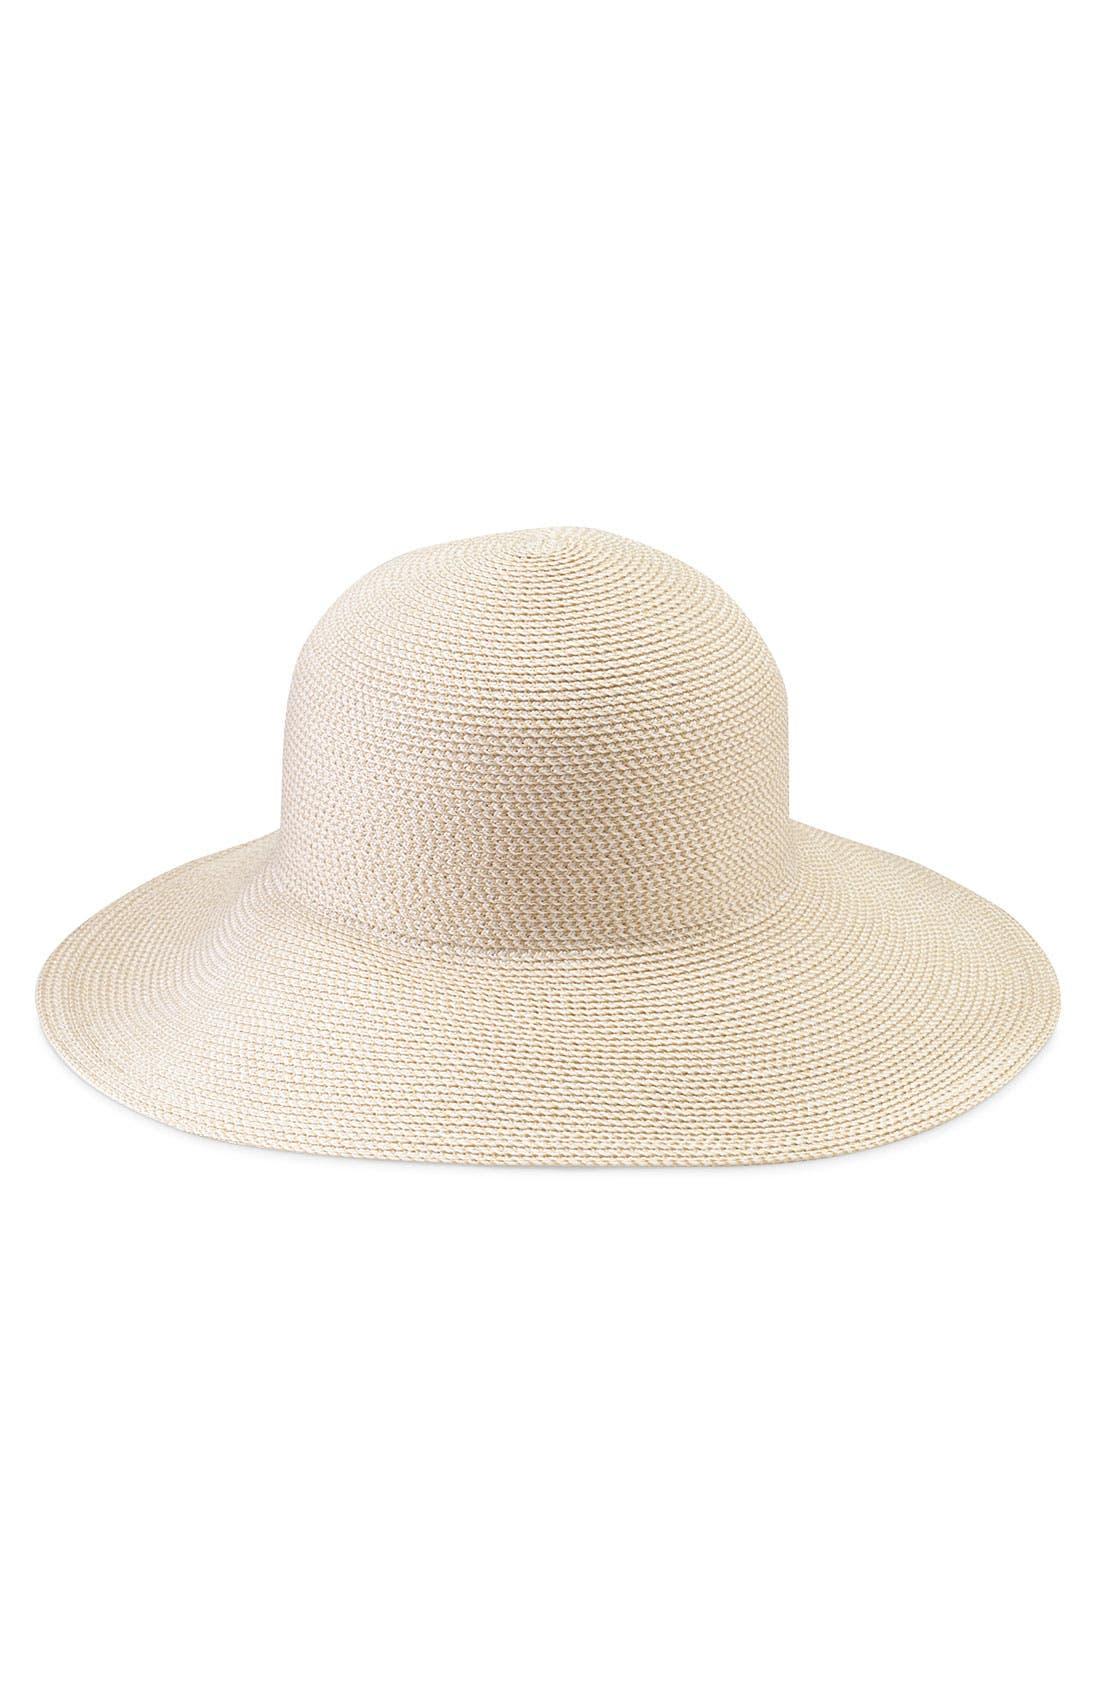 Main Image - Eric Javits 'Squishee® IV' Wide Brim Hat